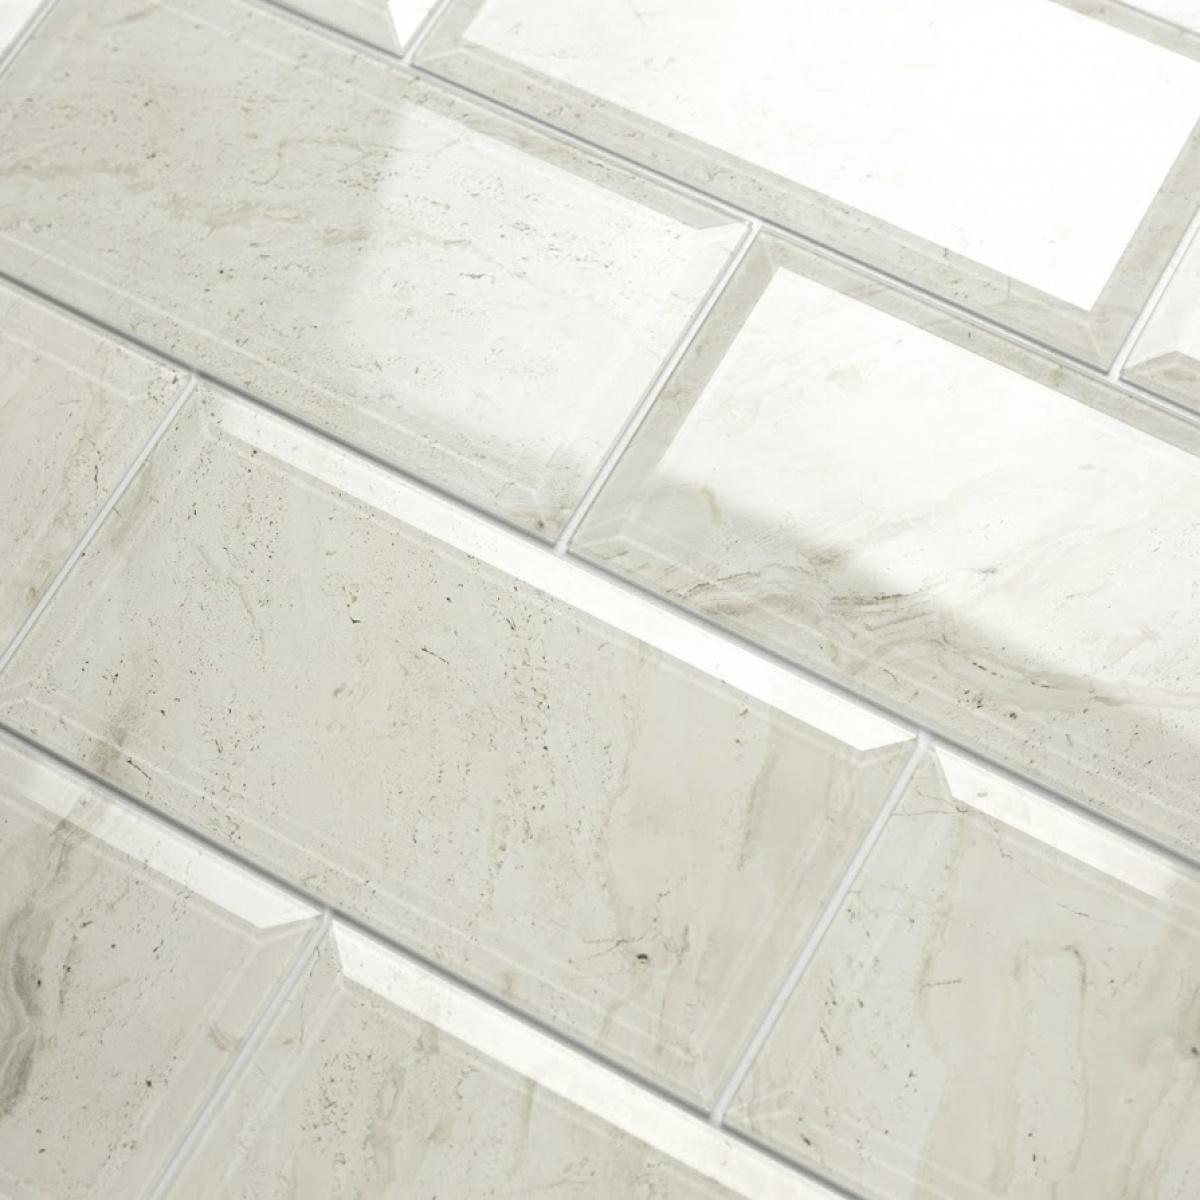 Gl Subway Tile In Crema Marfil